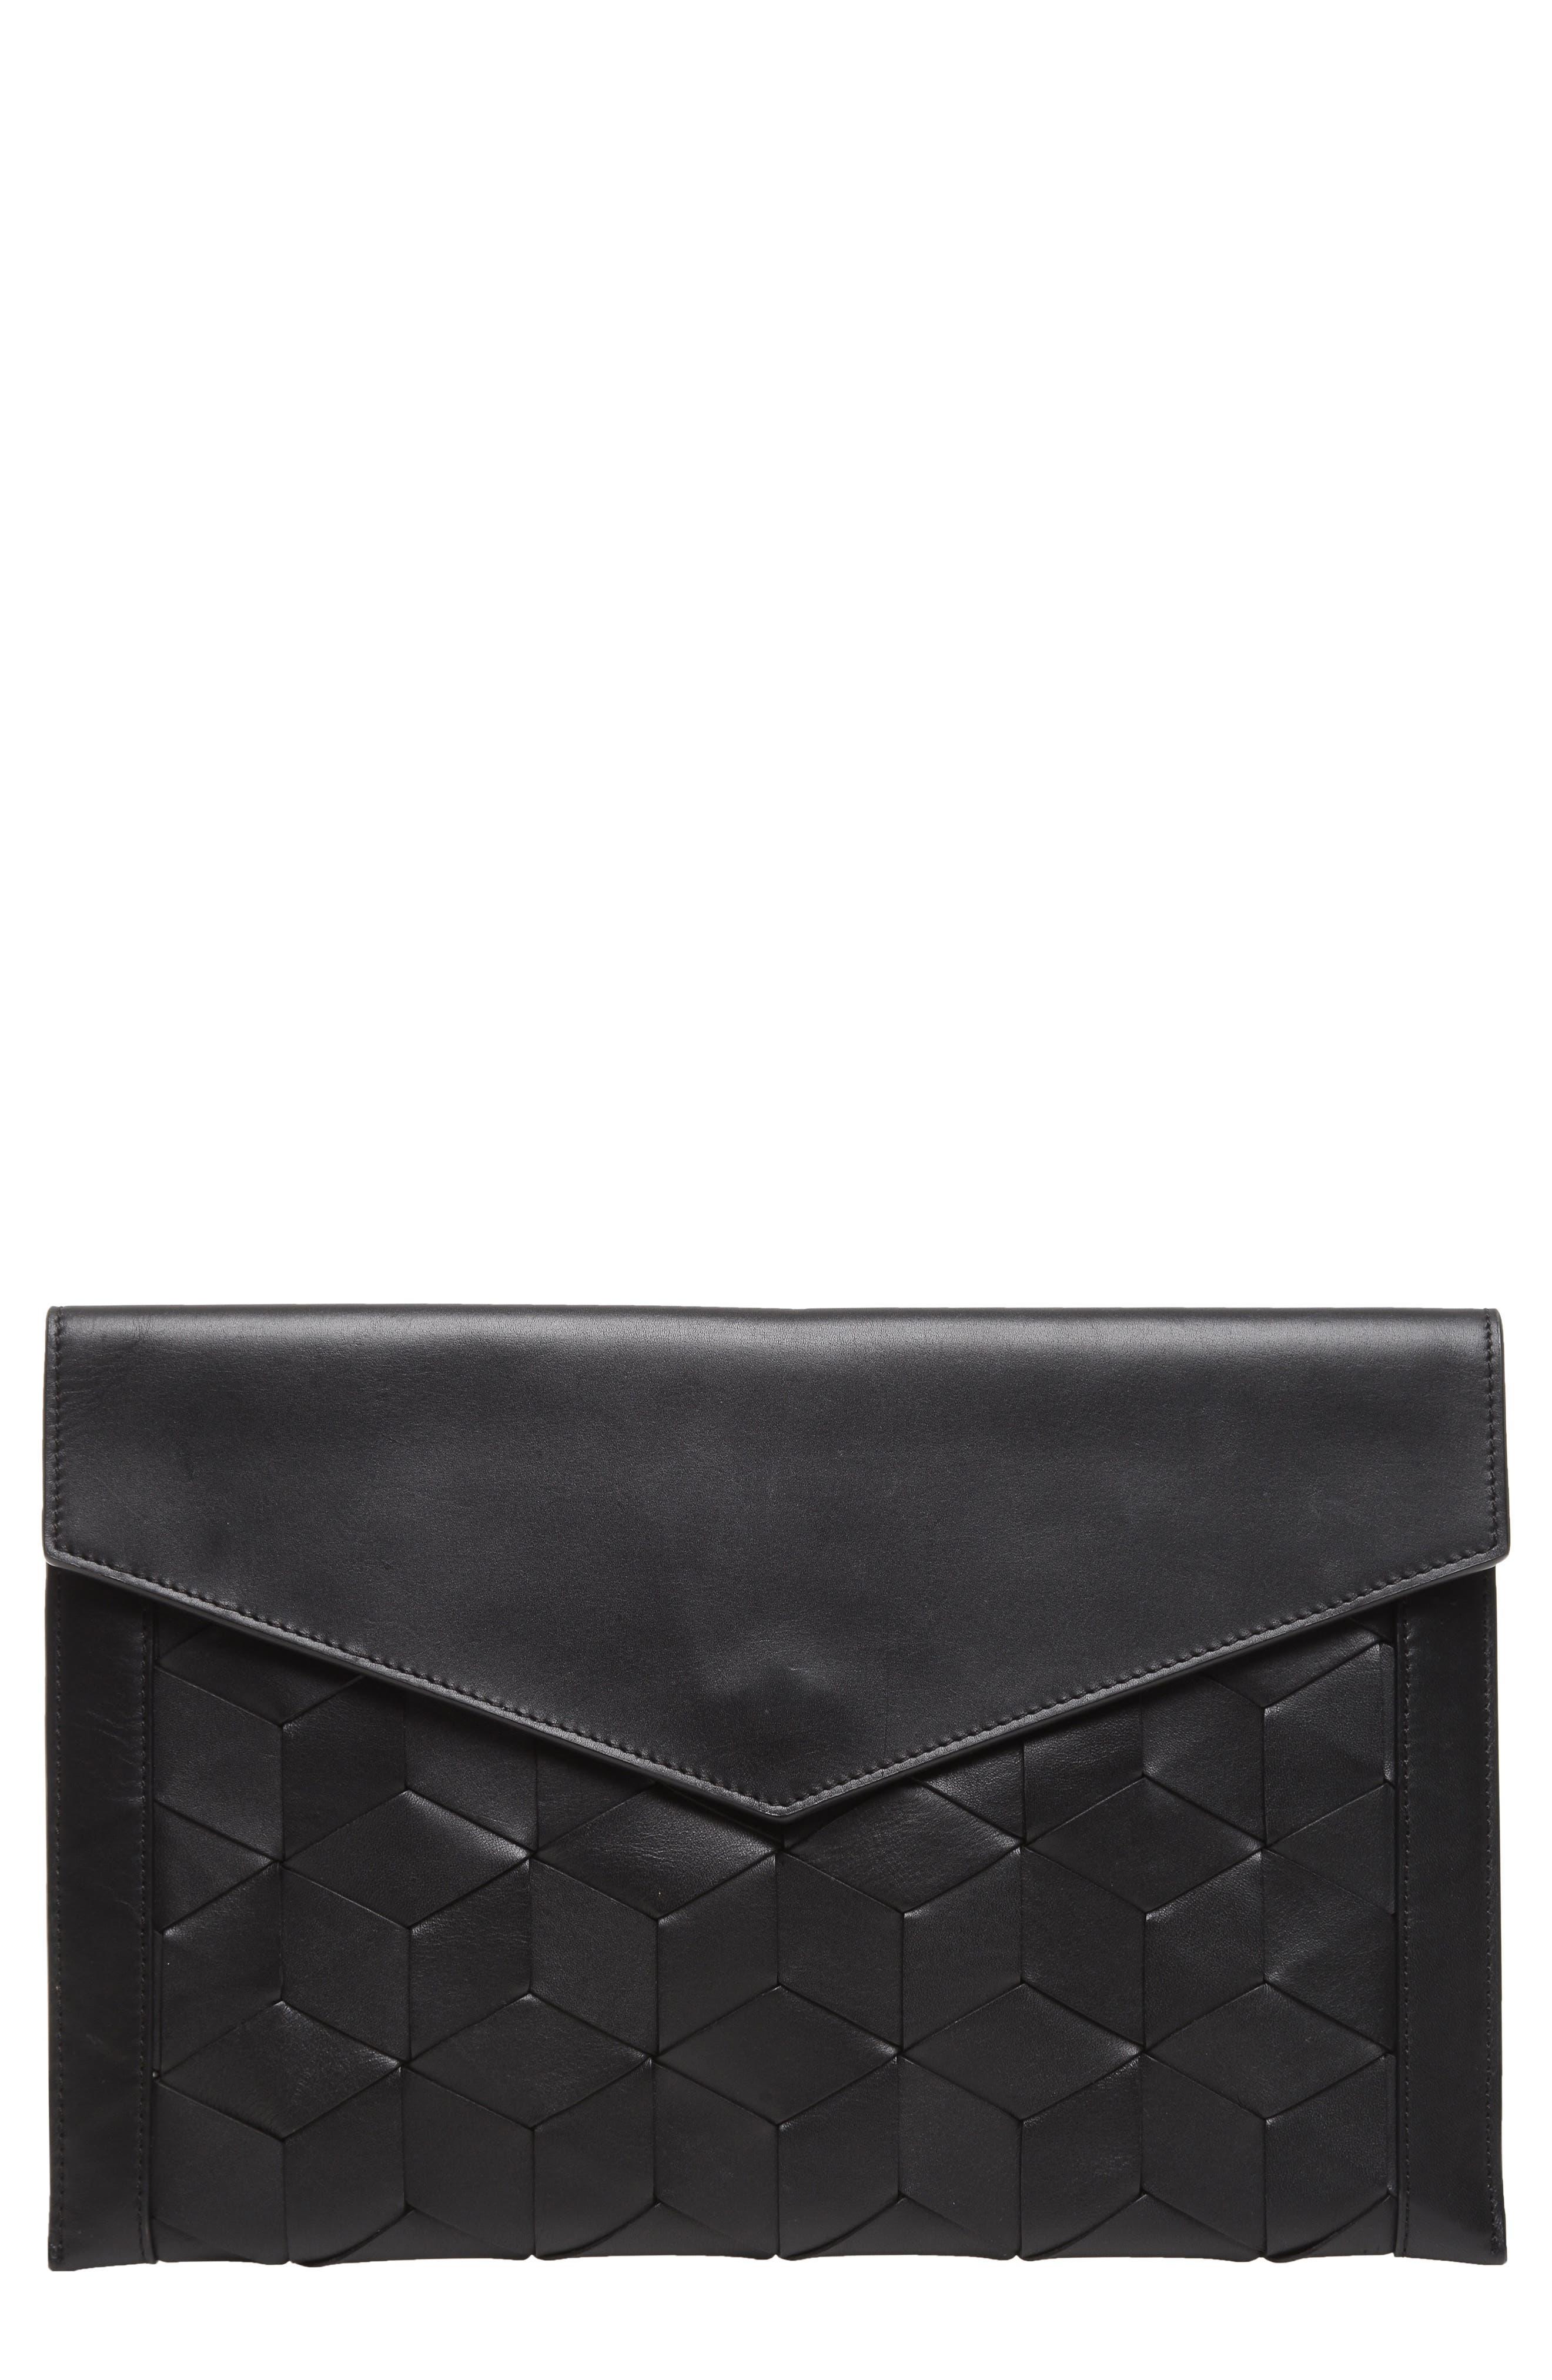 Mingle Woven Calfskin Leather Clutch,                         Main,                         color, BLACK